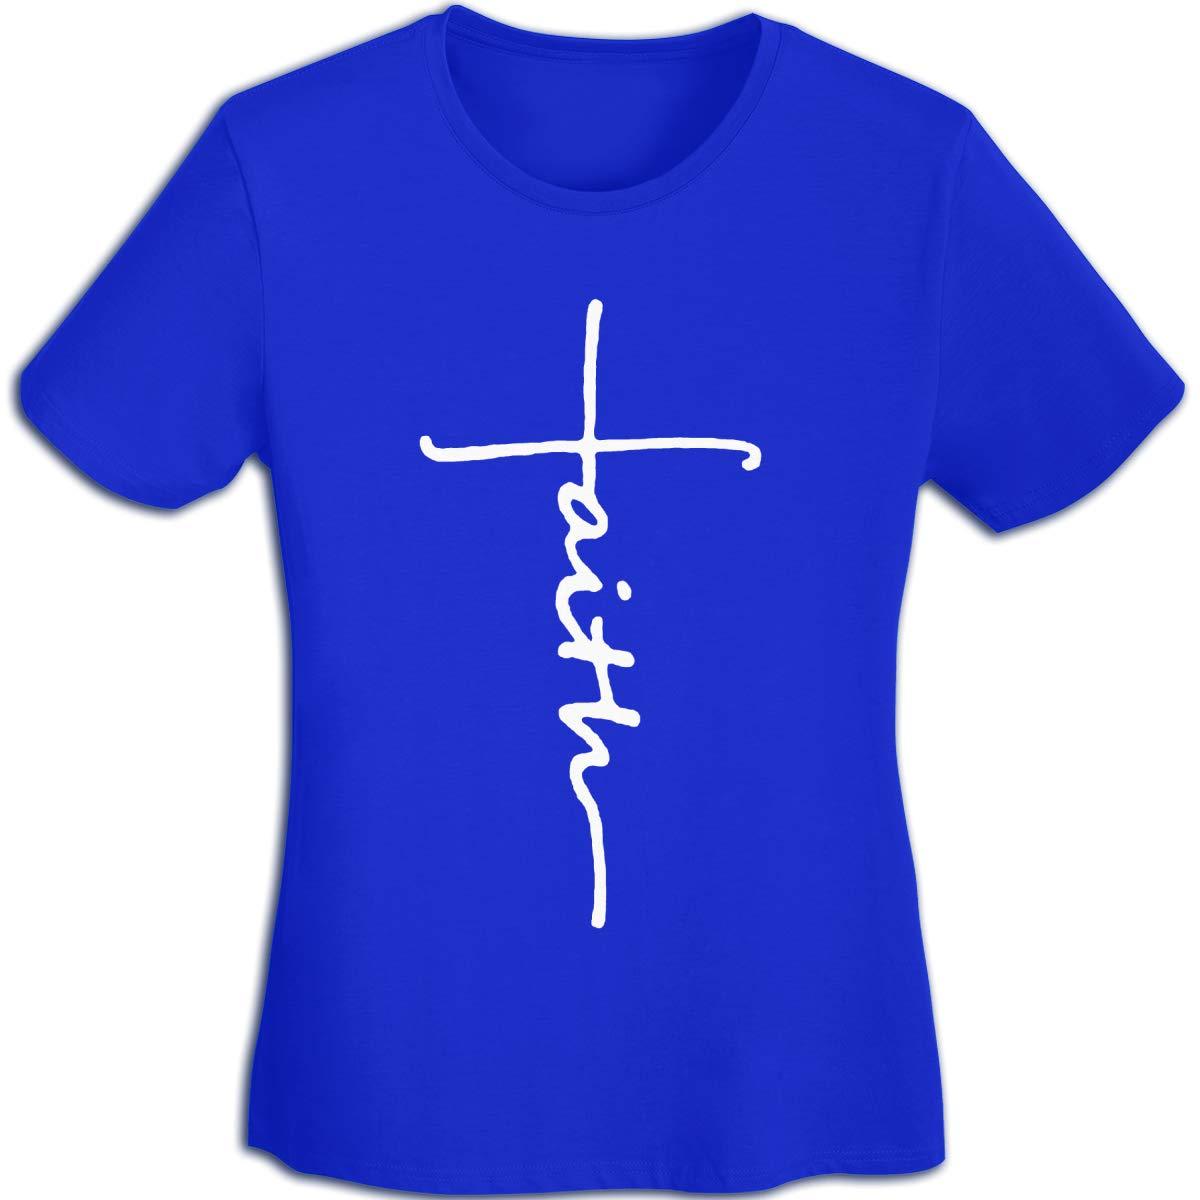 Women's T Shirt Cross Faith Shirts Jesus Tshirts Cotton Christian T-Shirt Short-Sleeve Tshirt for Women Youth Girls Blue L by BKashy